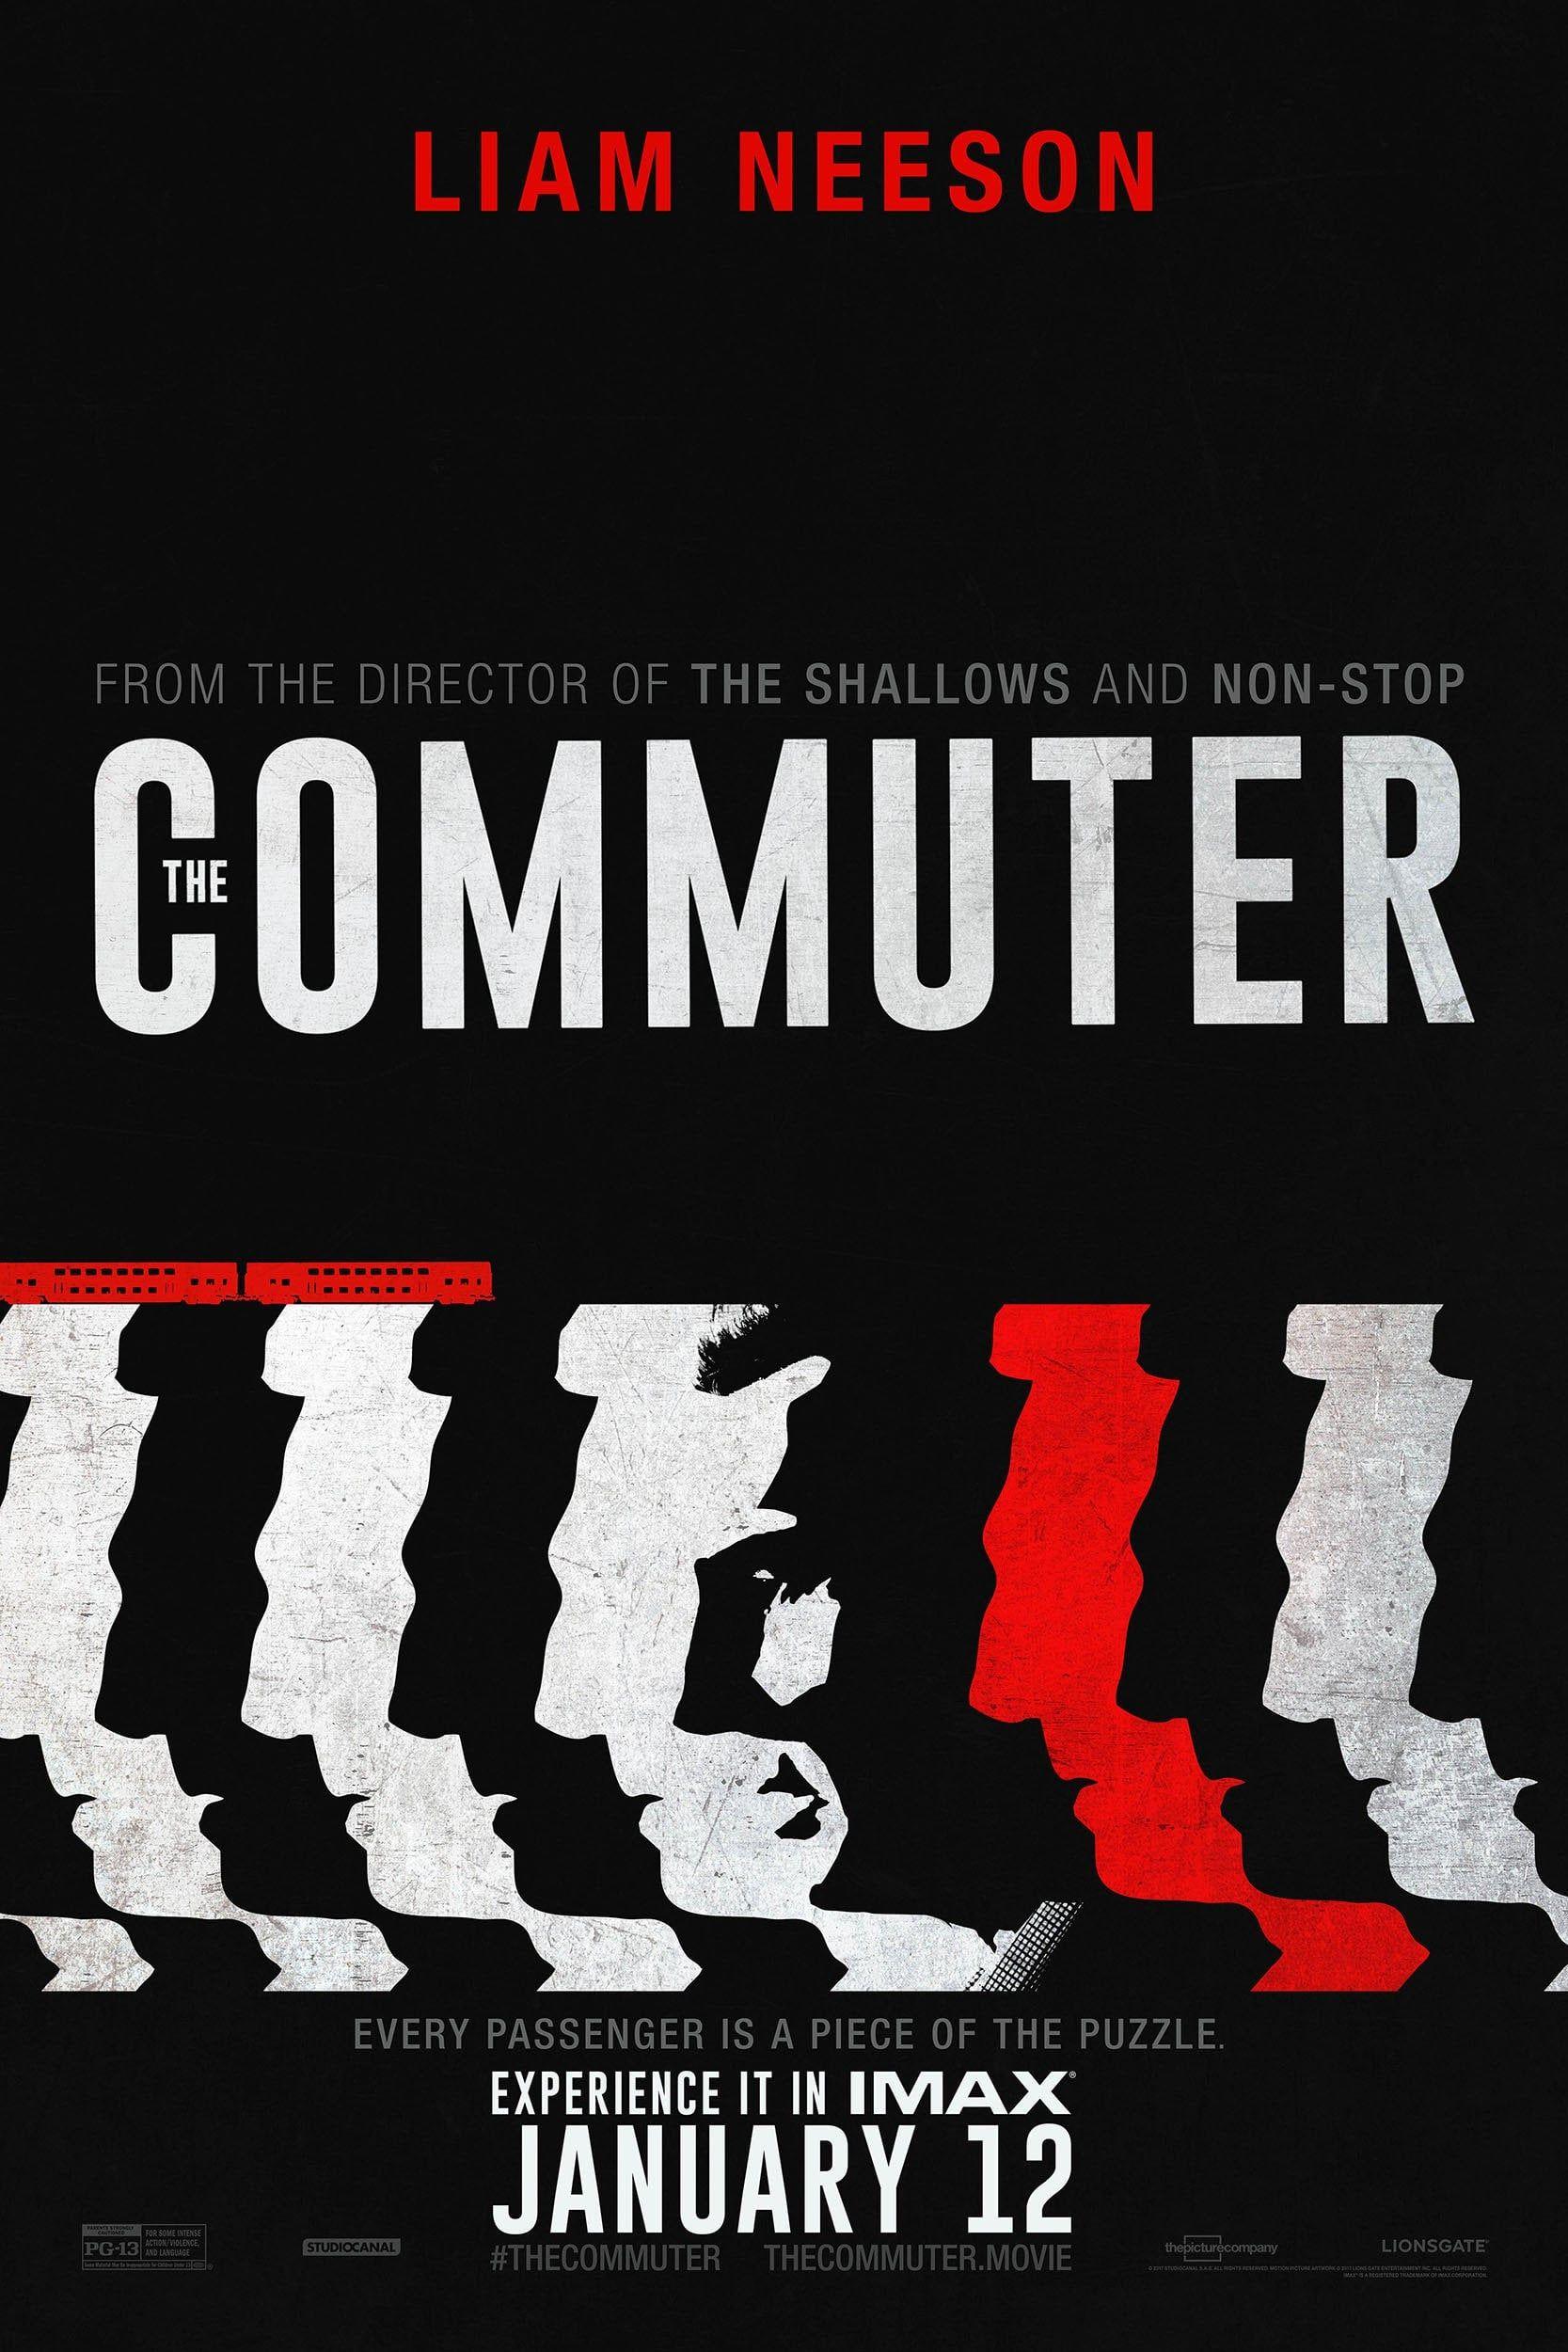 The Commuter (2018) Full Movie (BluRay Quality) Enjoy